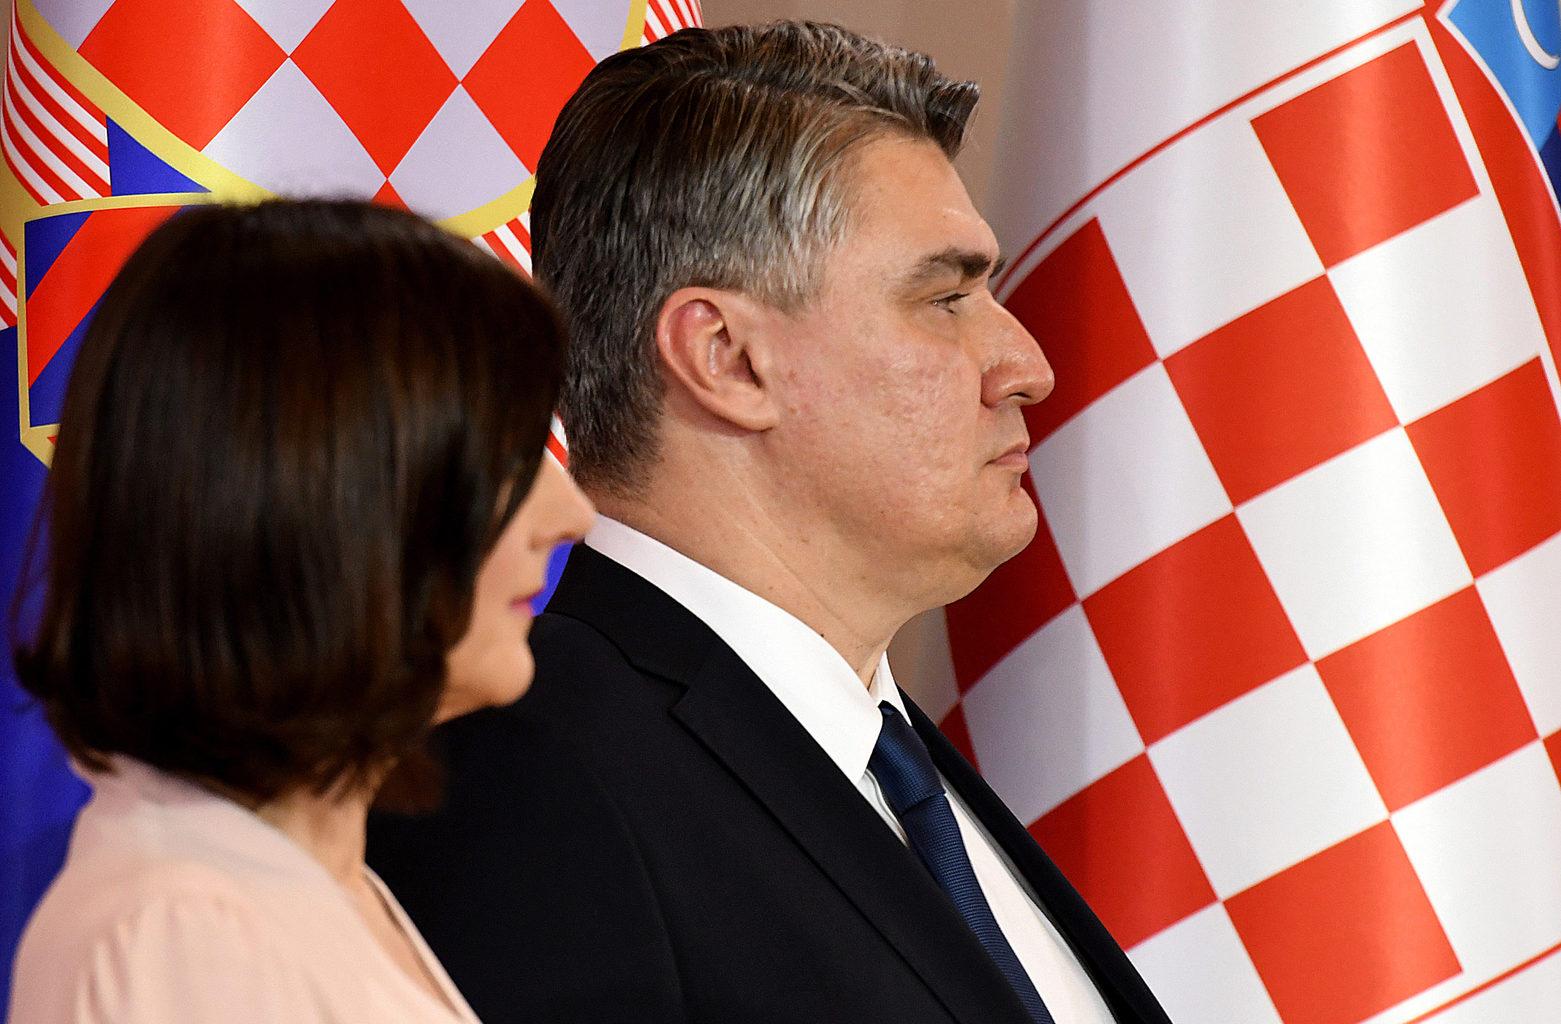 Zoran Milanović horvát elnök #moszkvater